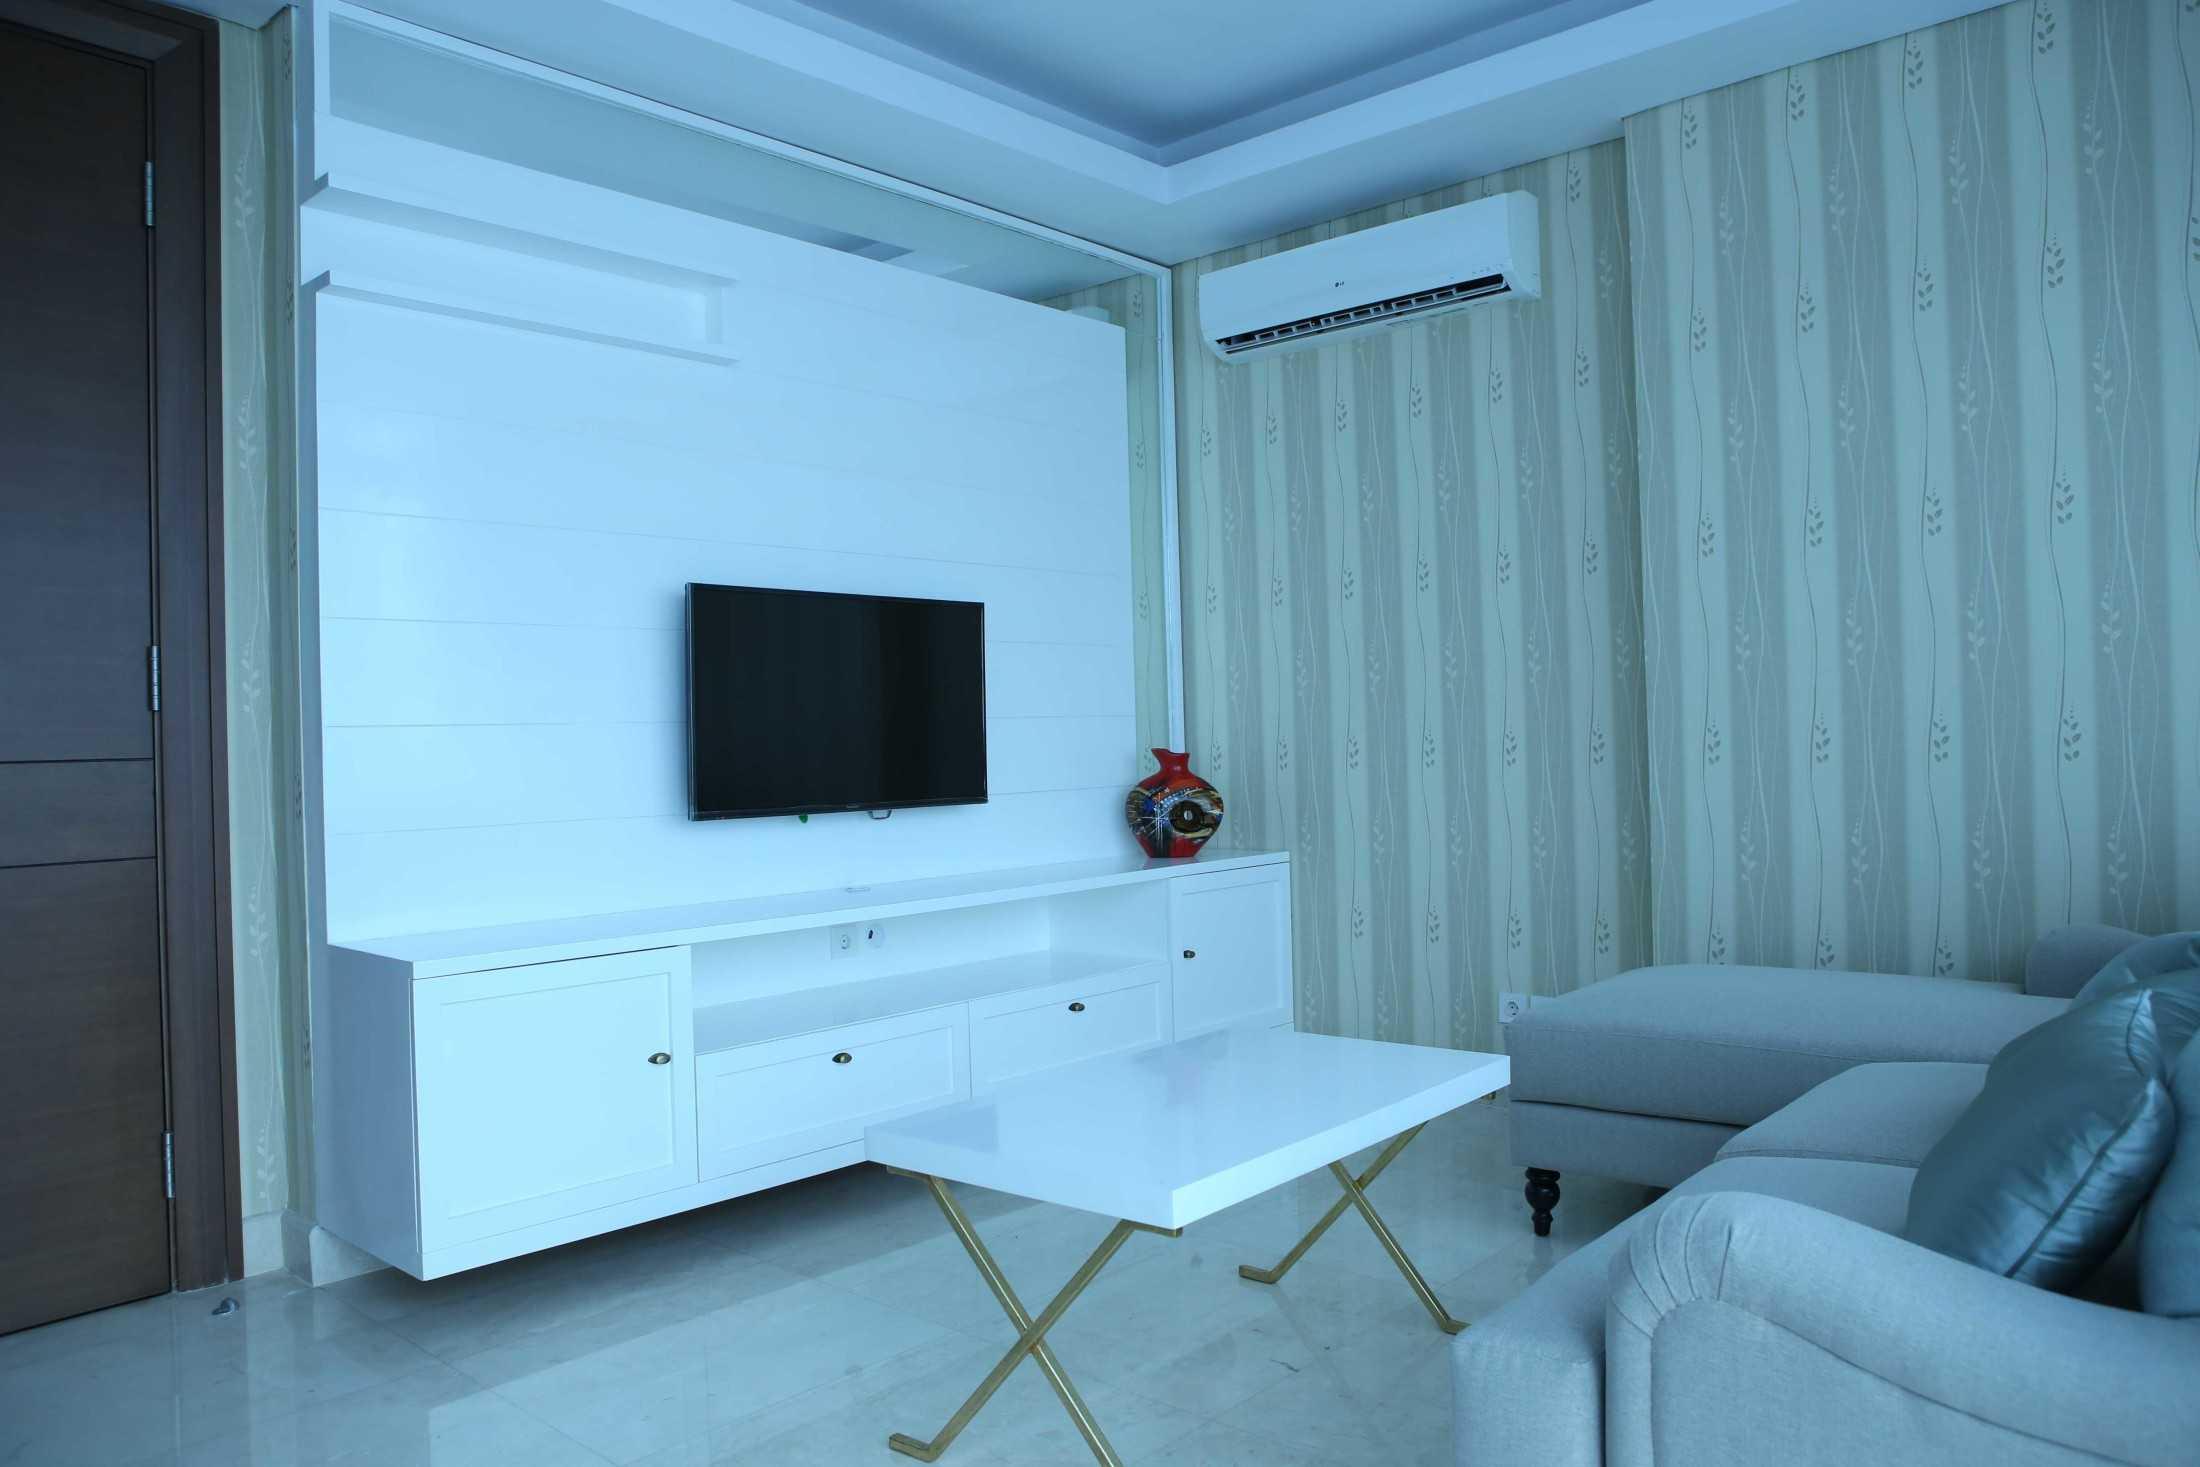 Jasa Interior Desainer Home by Fabelio.com di Jakarta